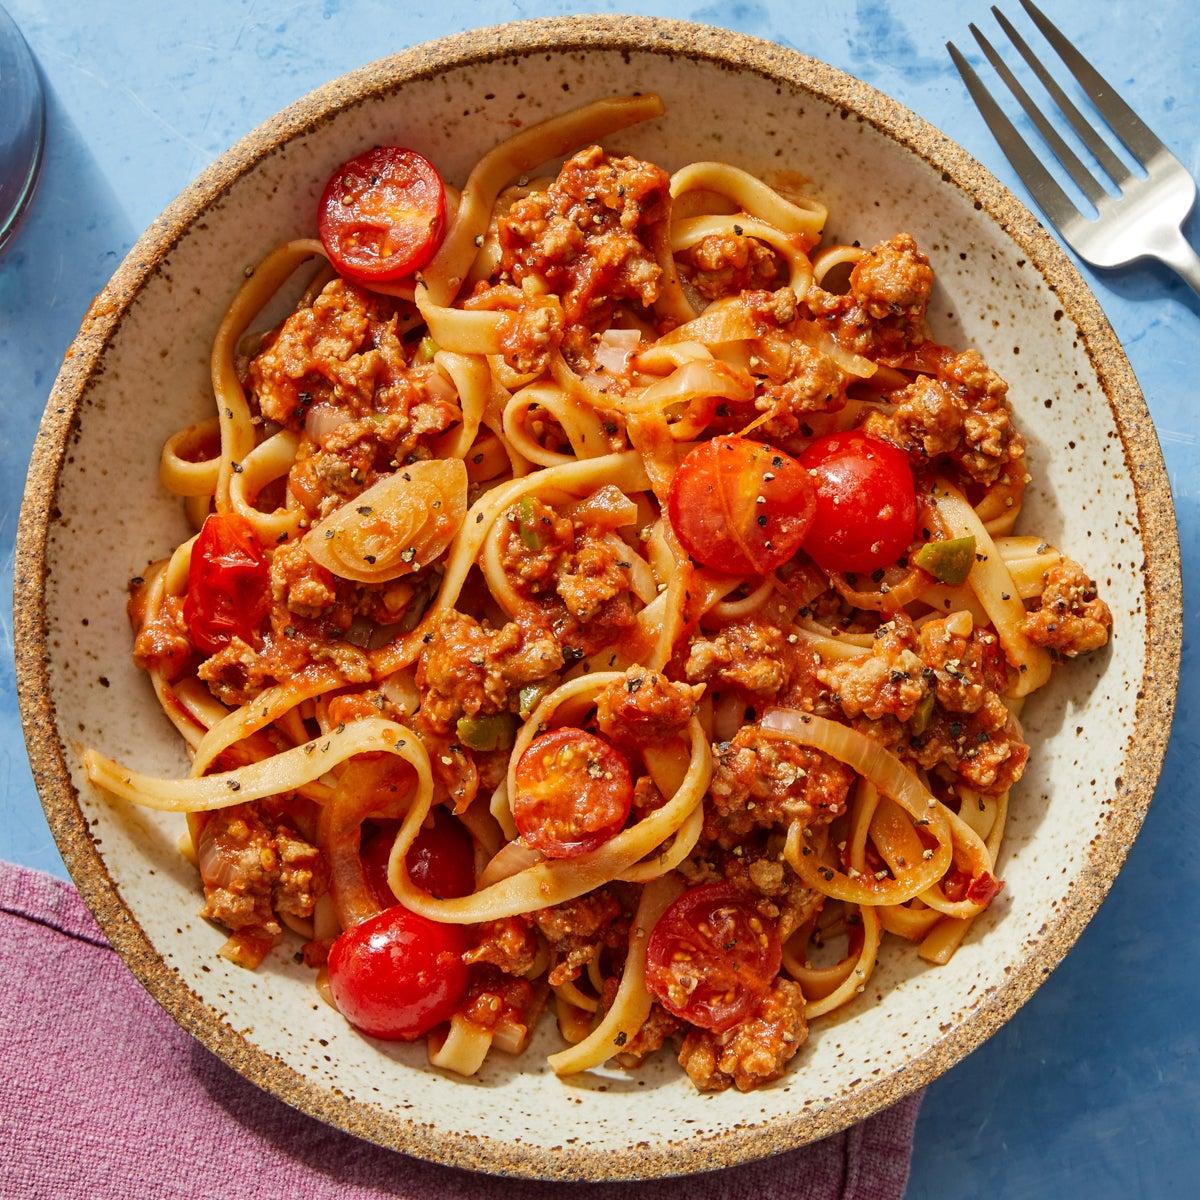 Fettuccine & Pork Ragù with Fresh Tomatoes  & Olives